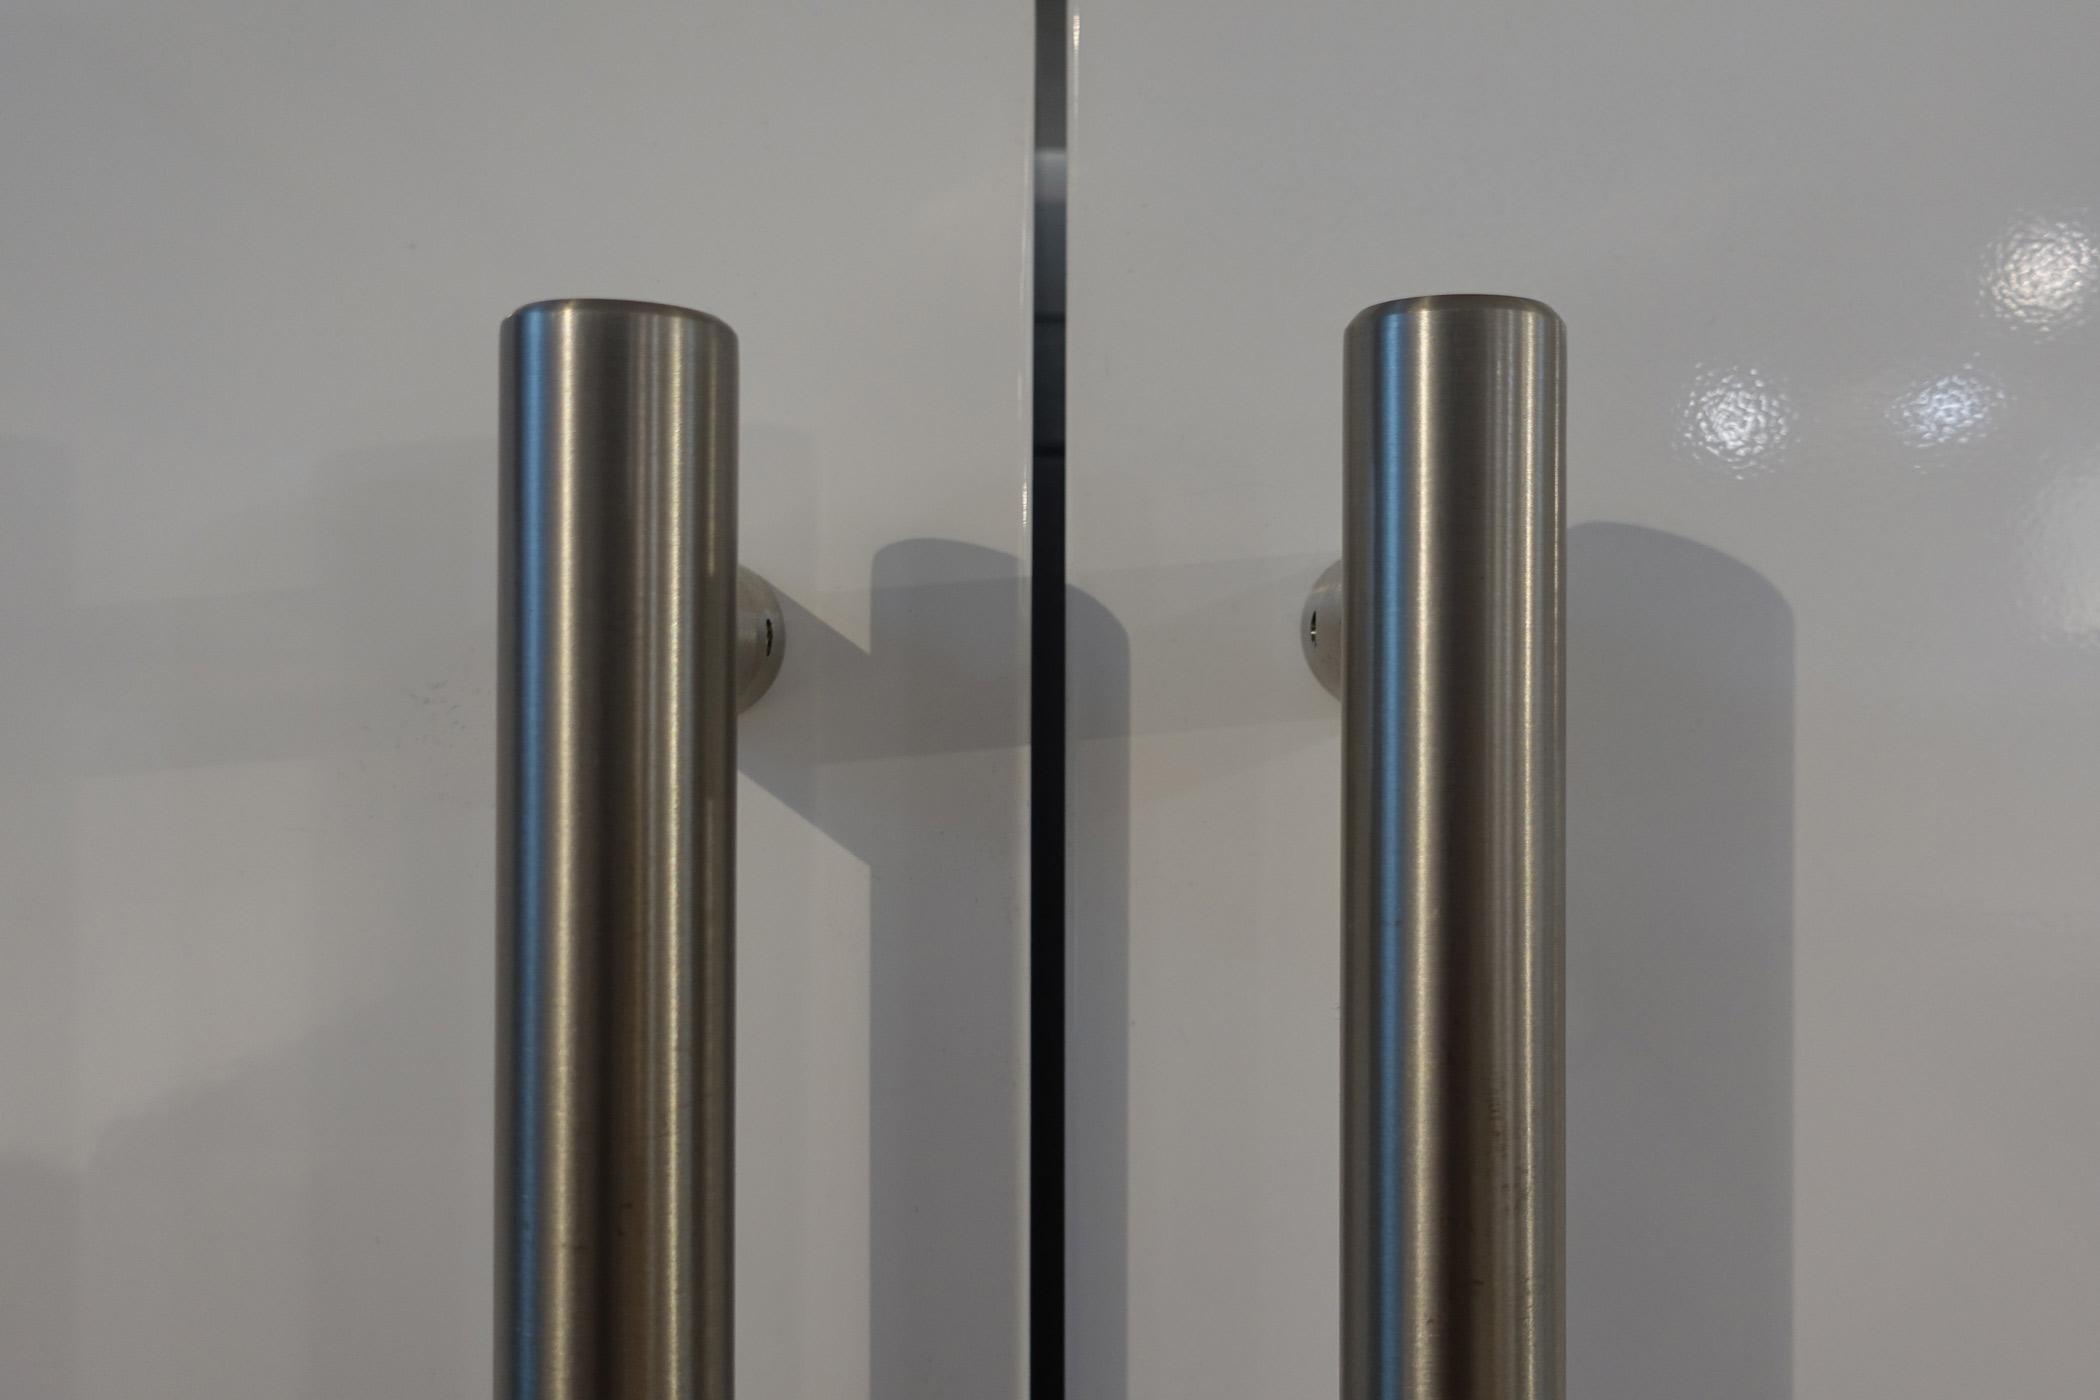 Amerikanischer Kühlschrank Rot : O f classic side by side kühlschrank mit dispenser welter